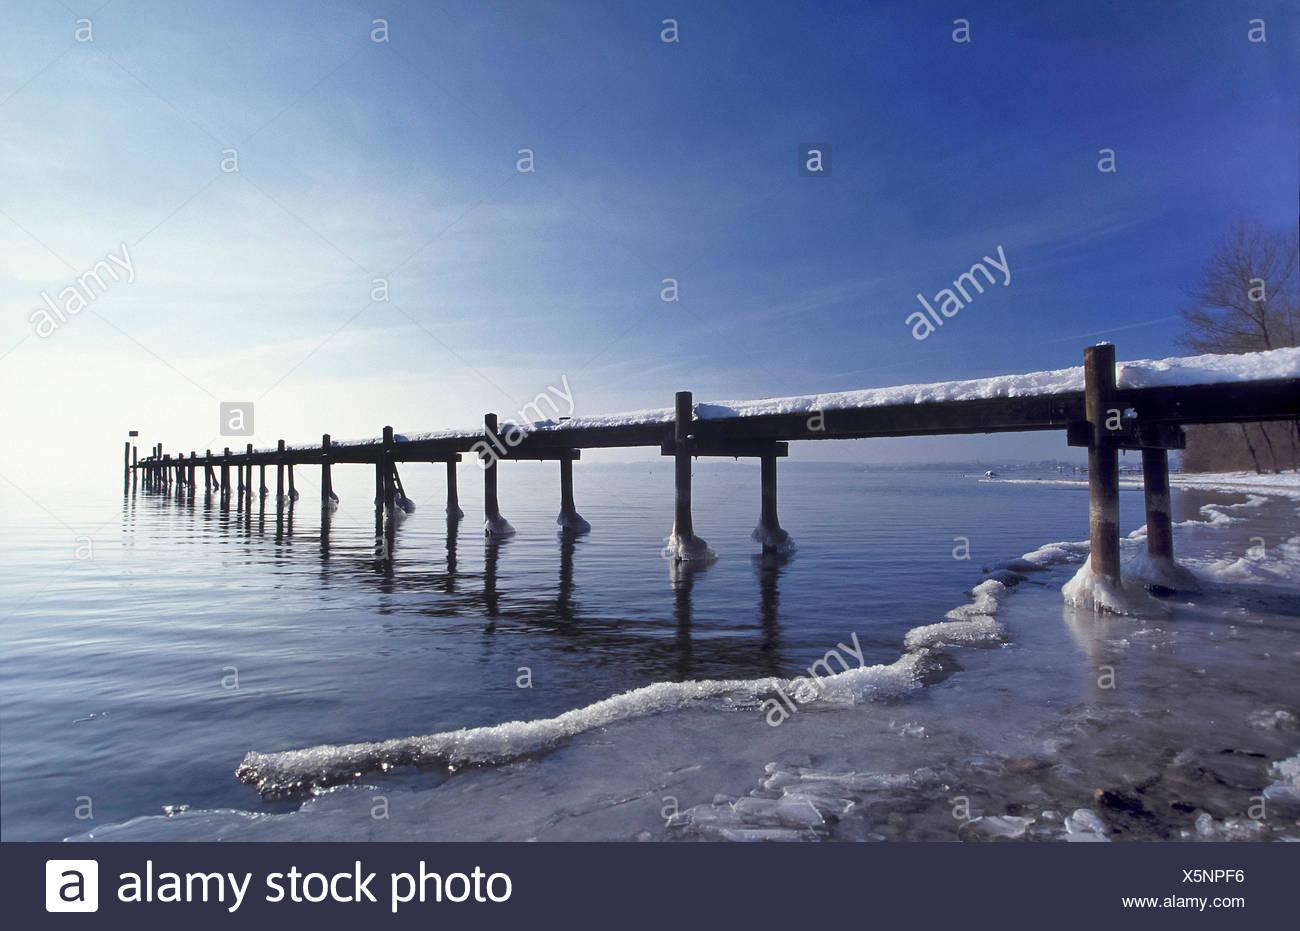 Bavaria, Europe, Germany, Upper Bavaria, Chiemsee, Herreninsel, Herrenwörth, Chiemgau, sky, lake, water, footbridge, water, ice, - Stock Image